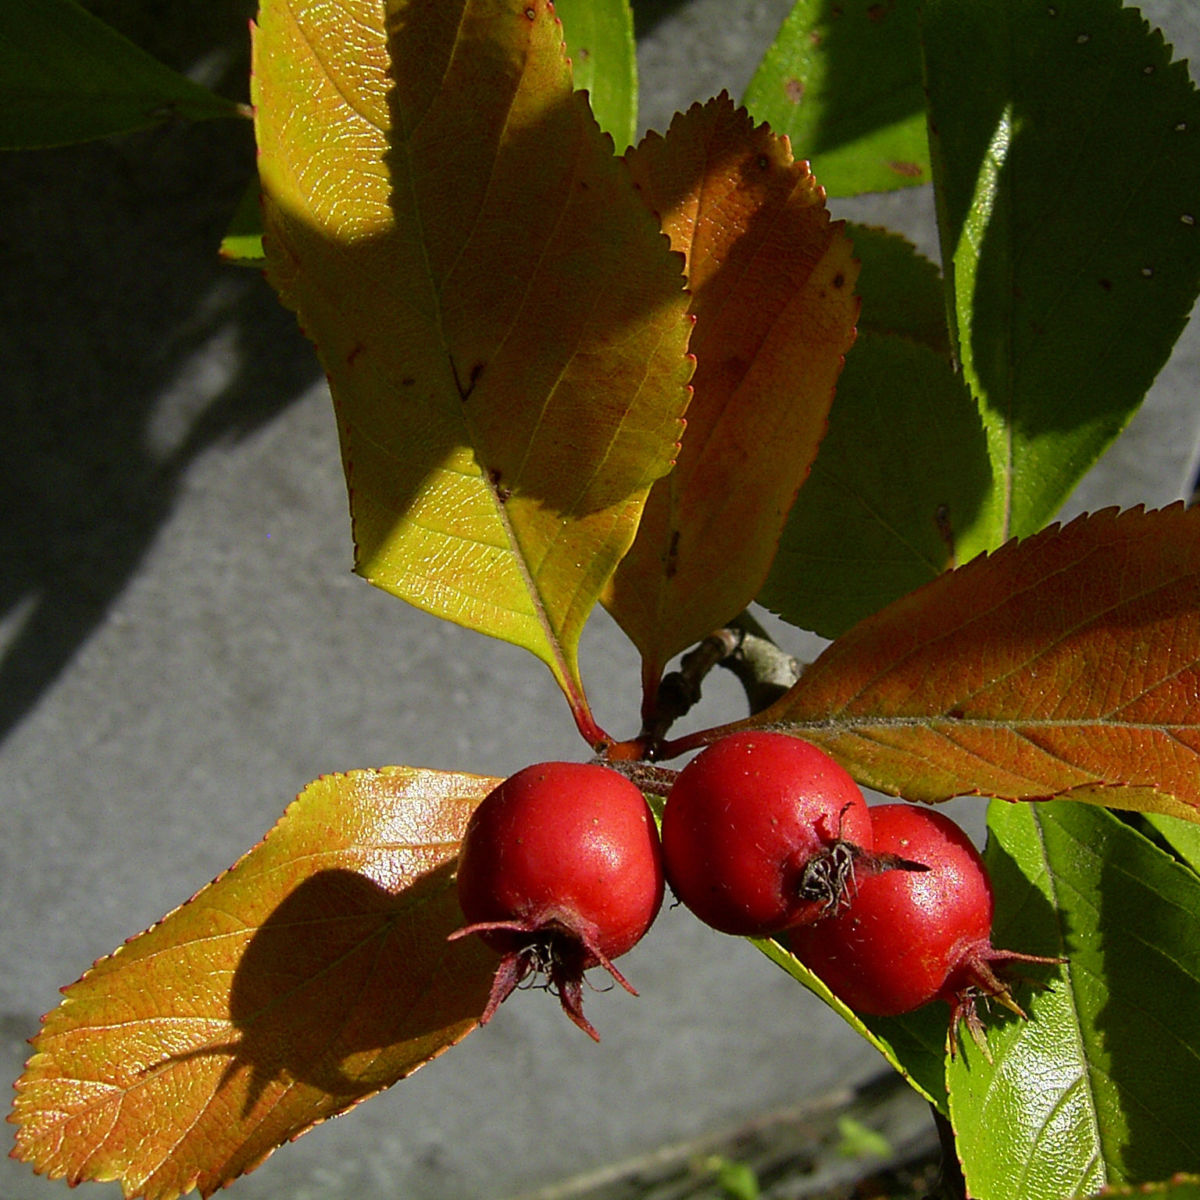 Weissdorn rote Fruechte Crataegus viridis